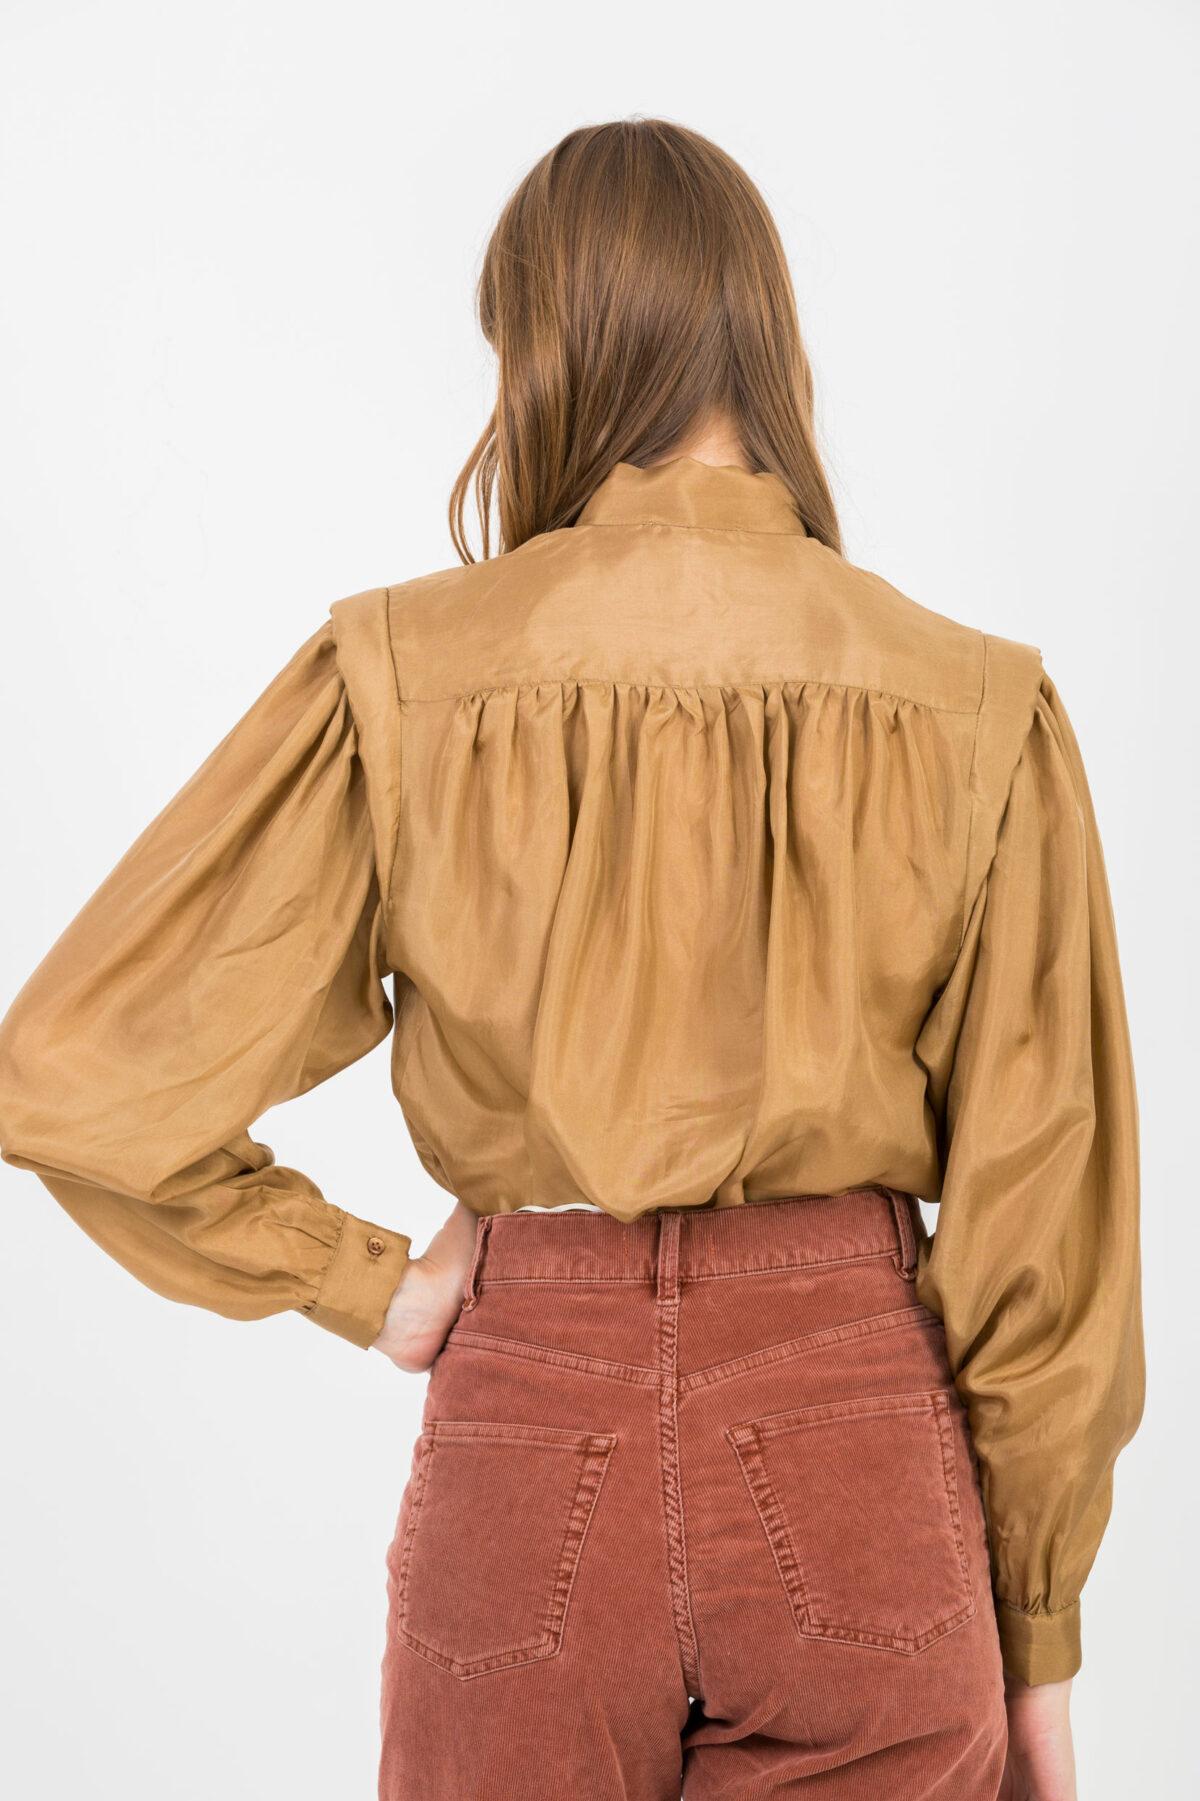 nyota-bronze-shirt-padding-shoulders-mesdemoiselles-matchboxathens